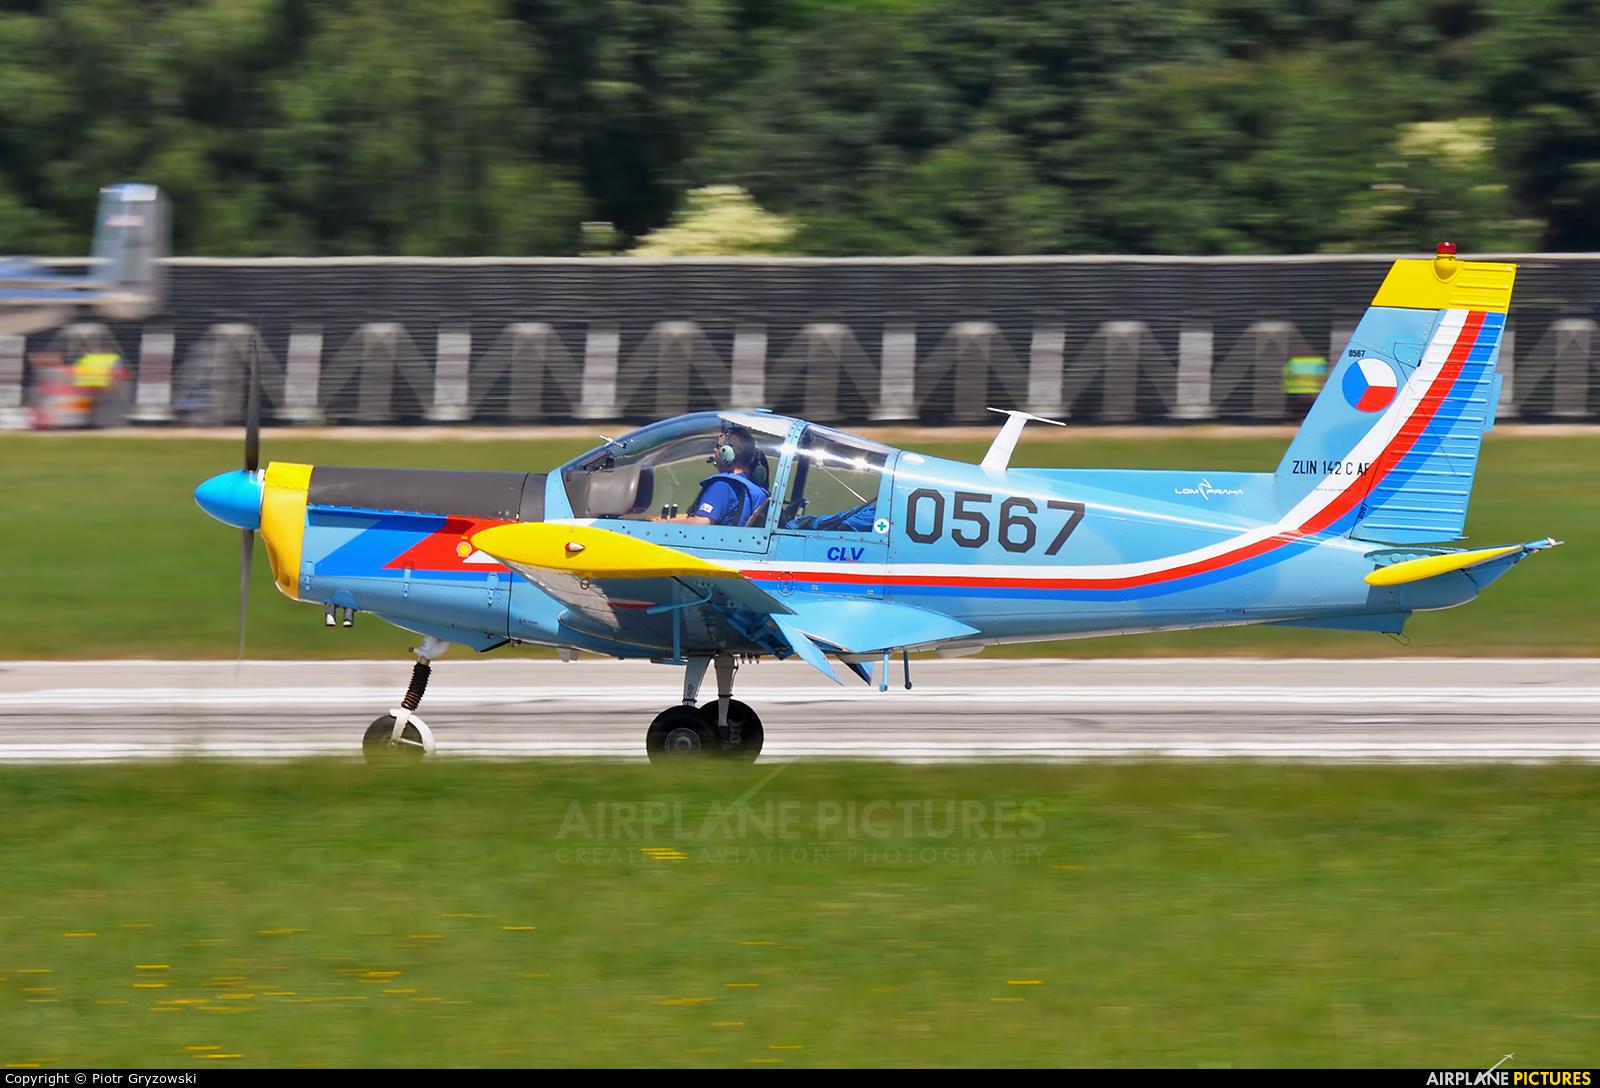 Czech - Air Force 0567 aircraft at Pardubice